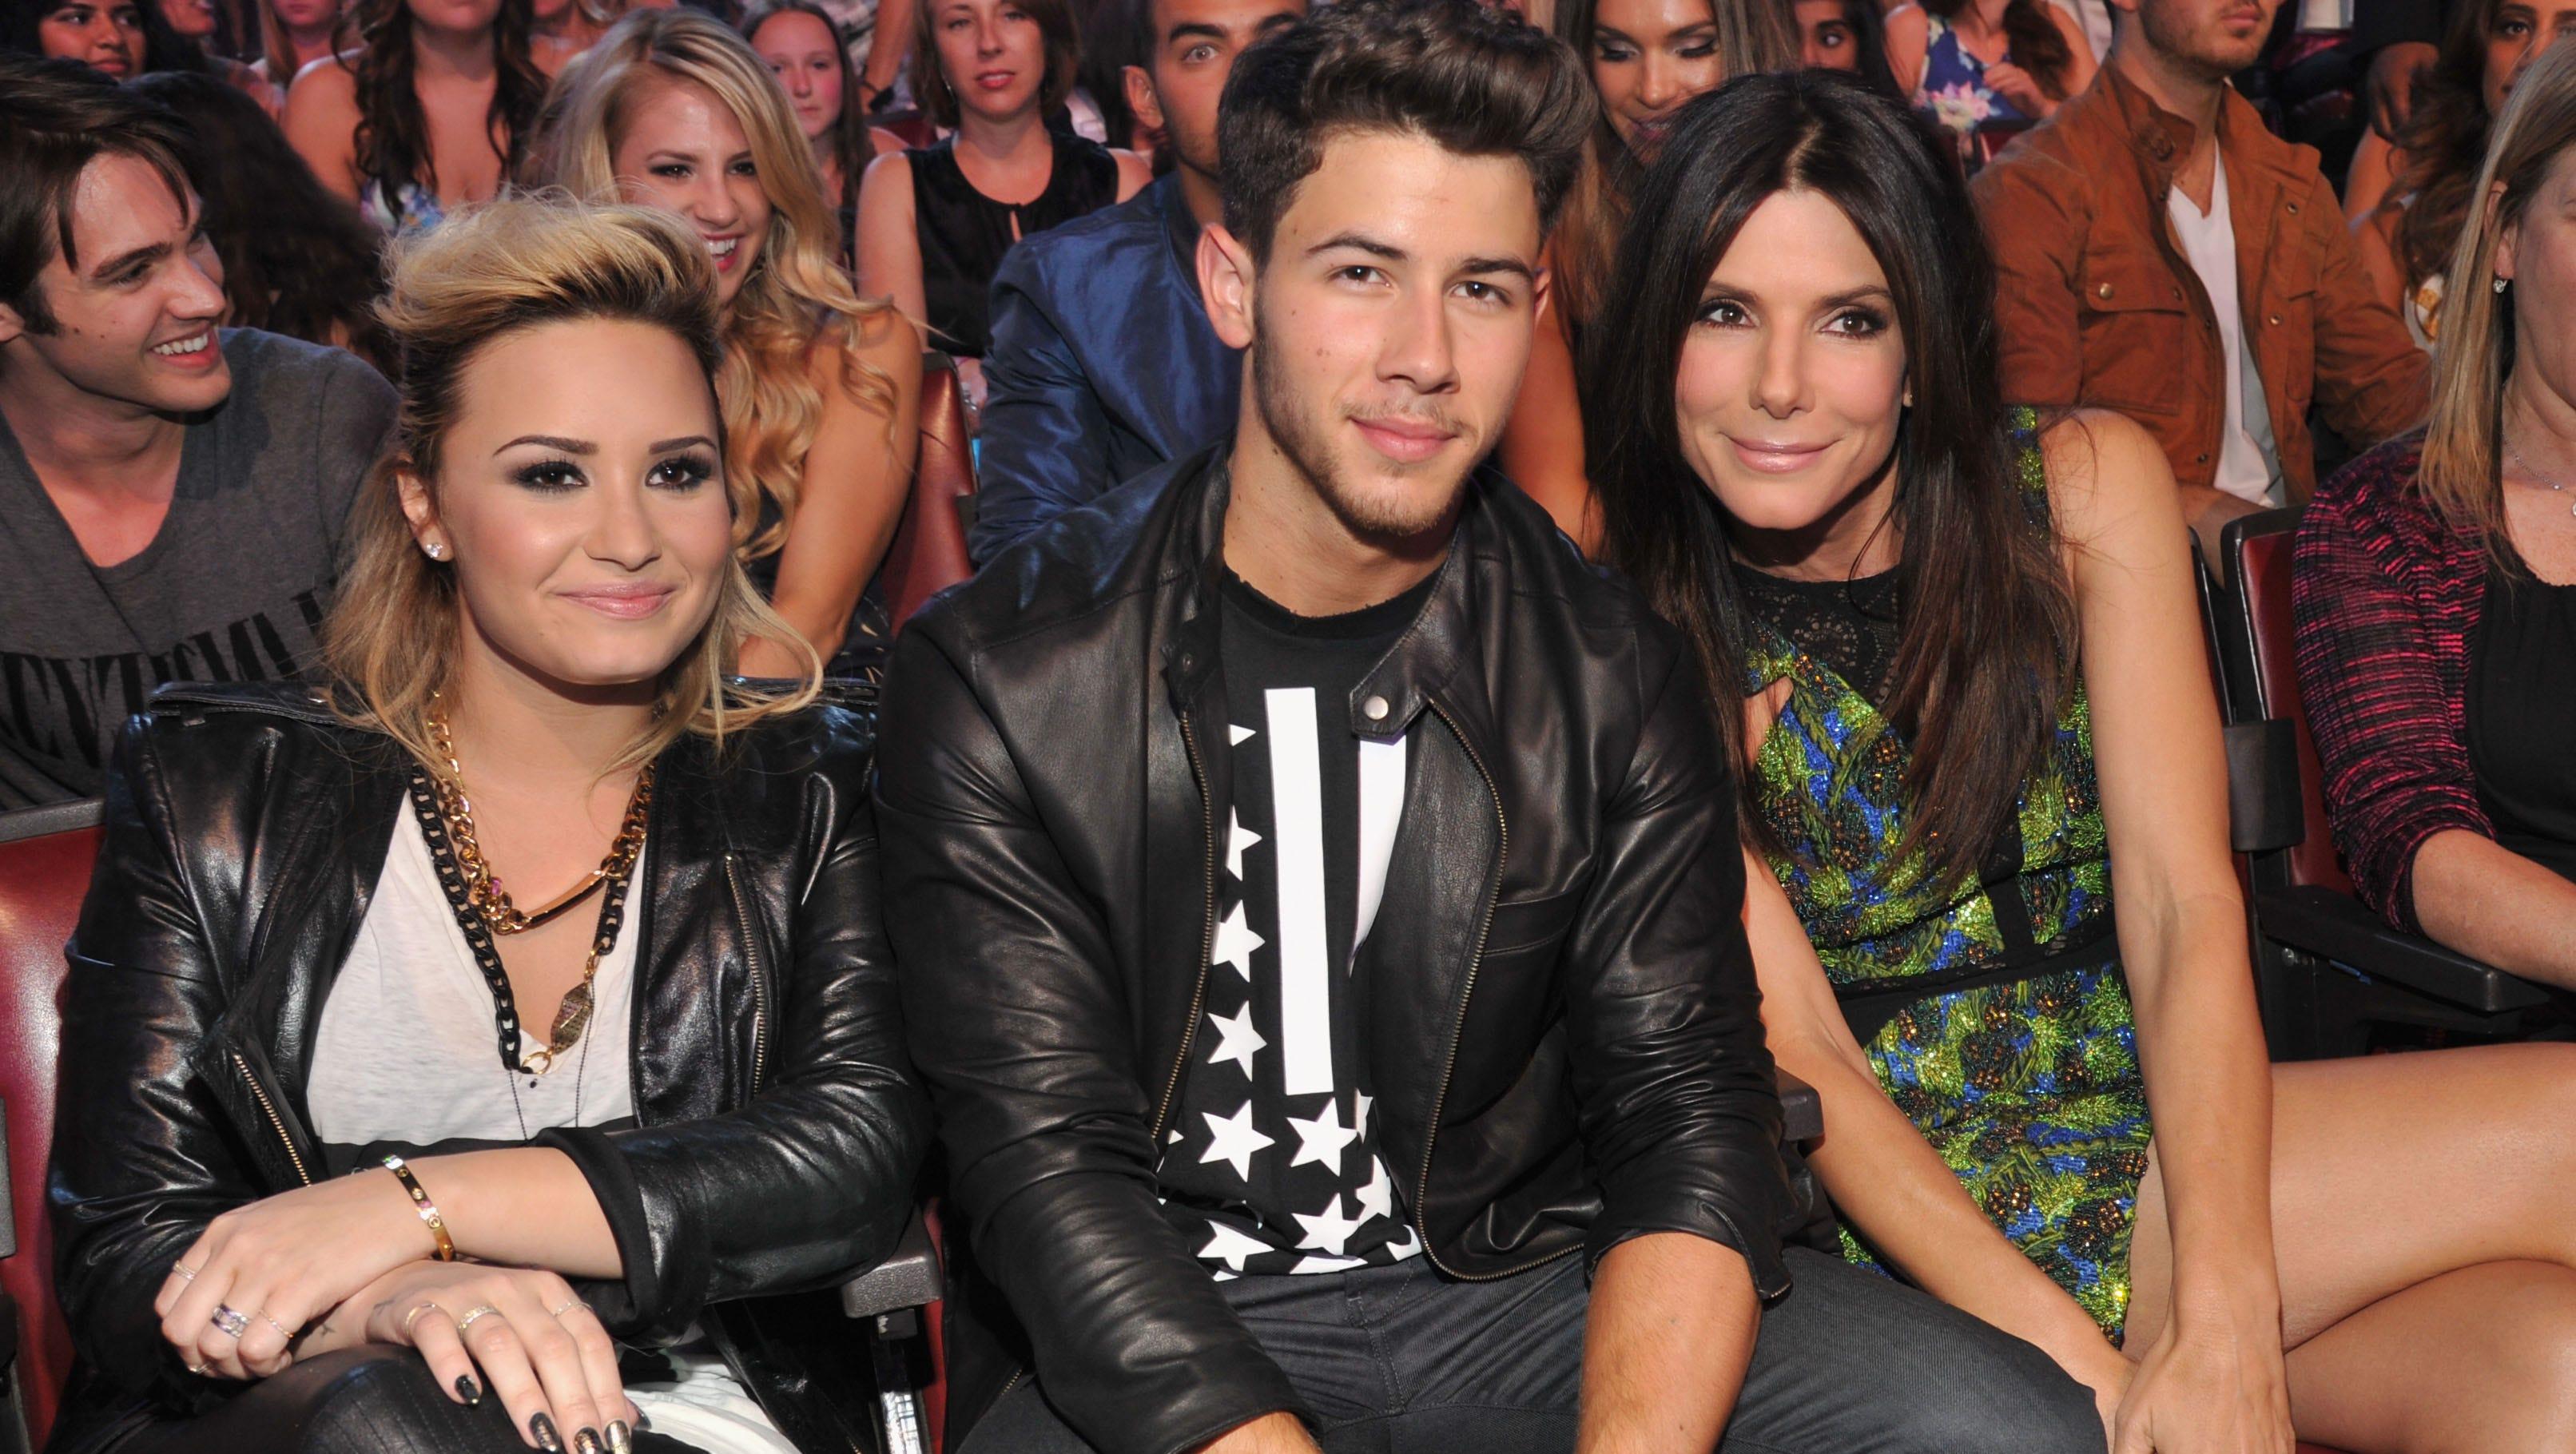 Musicians Demi Lovato, Nick Jonas, and actress Sandra Bullock  enjoy the show.